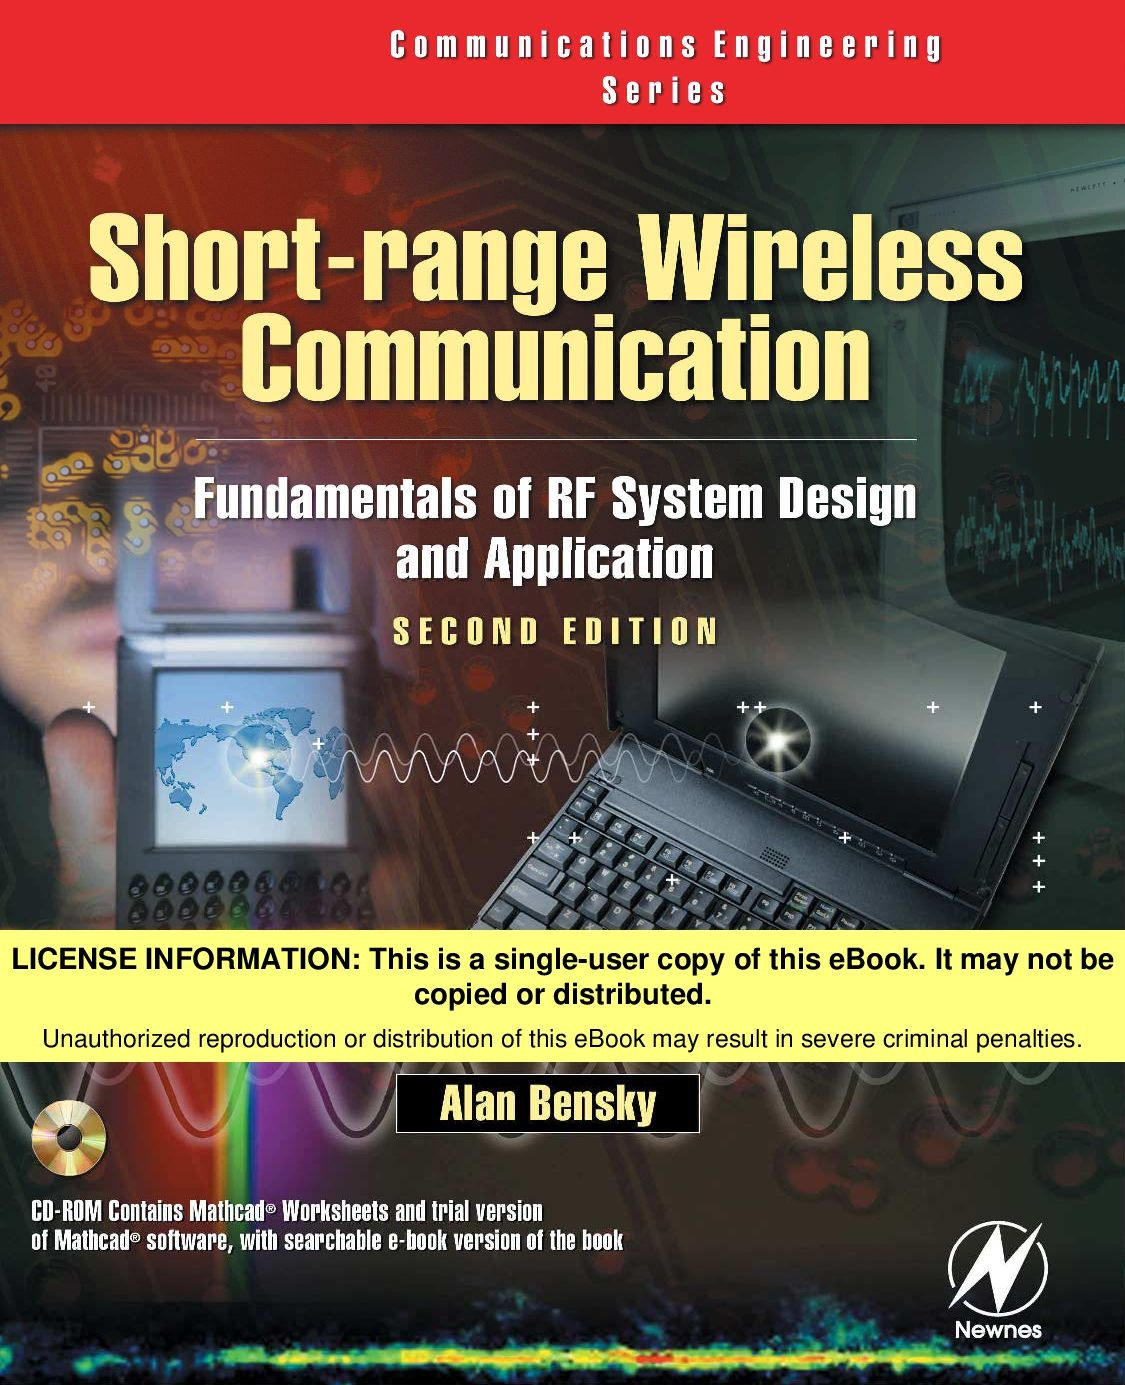 Short Range Wireless Communication Fundamentals Of Rf System Design And Application Pdf Download Servicemanual Operato Communication Fundamental Wireless